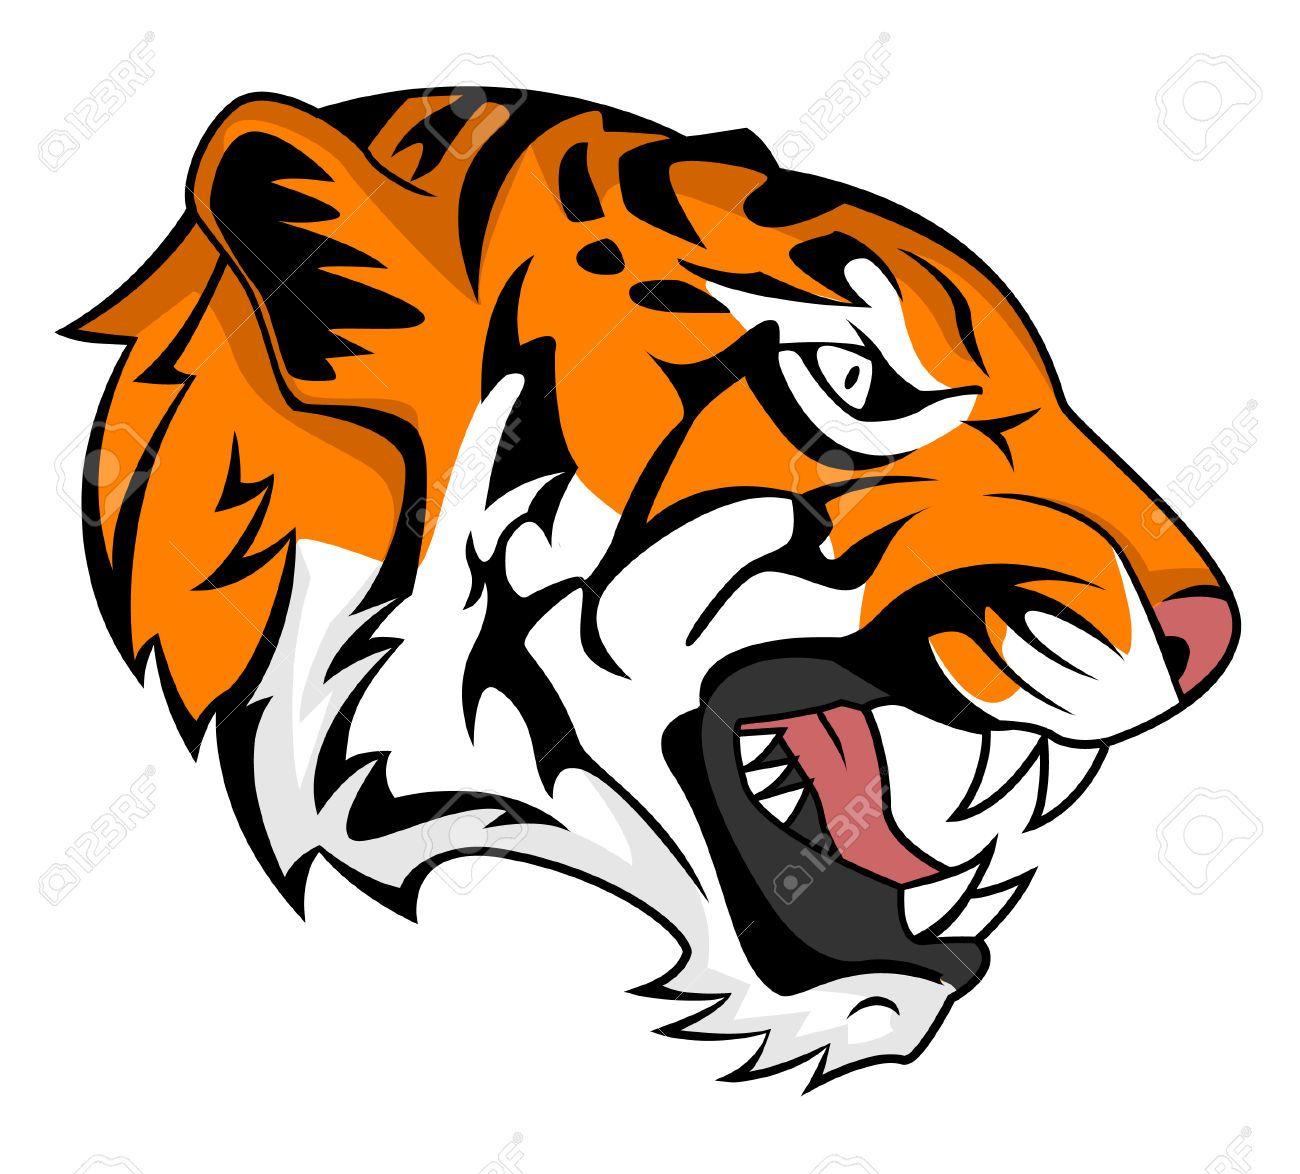 roaring tiger tattoo profile Google Search Seni